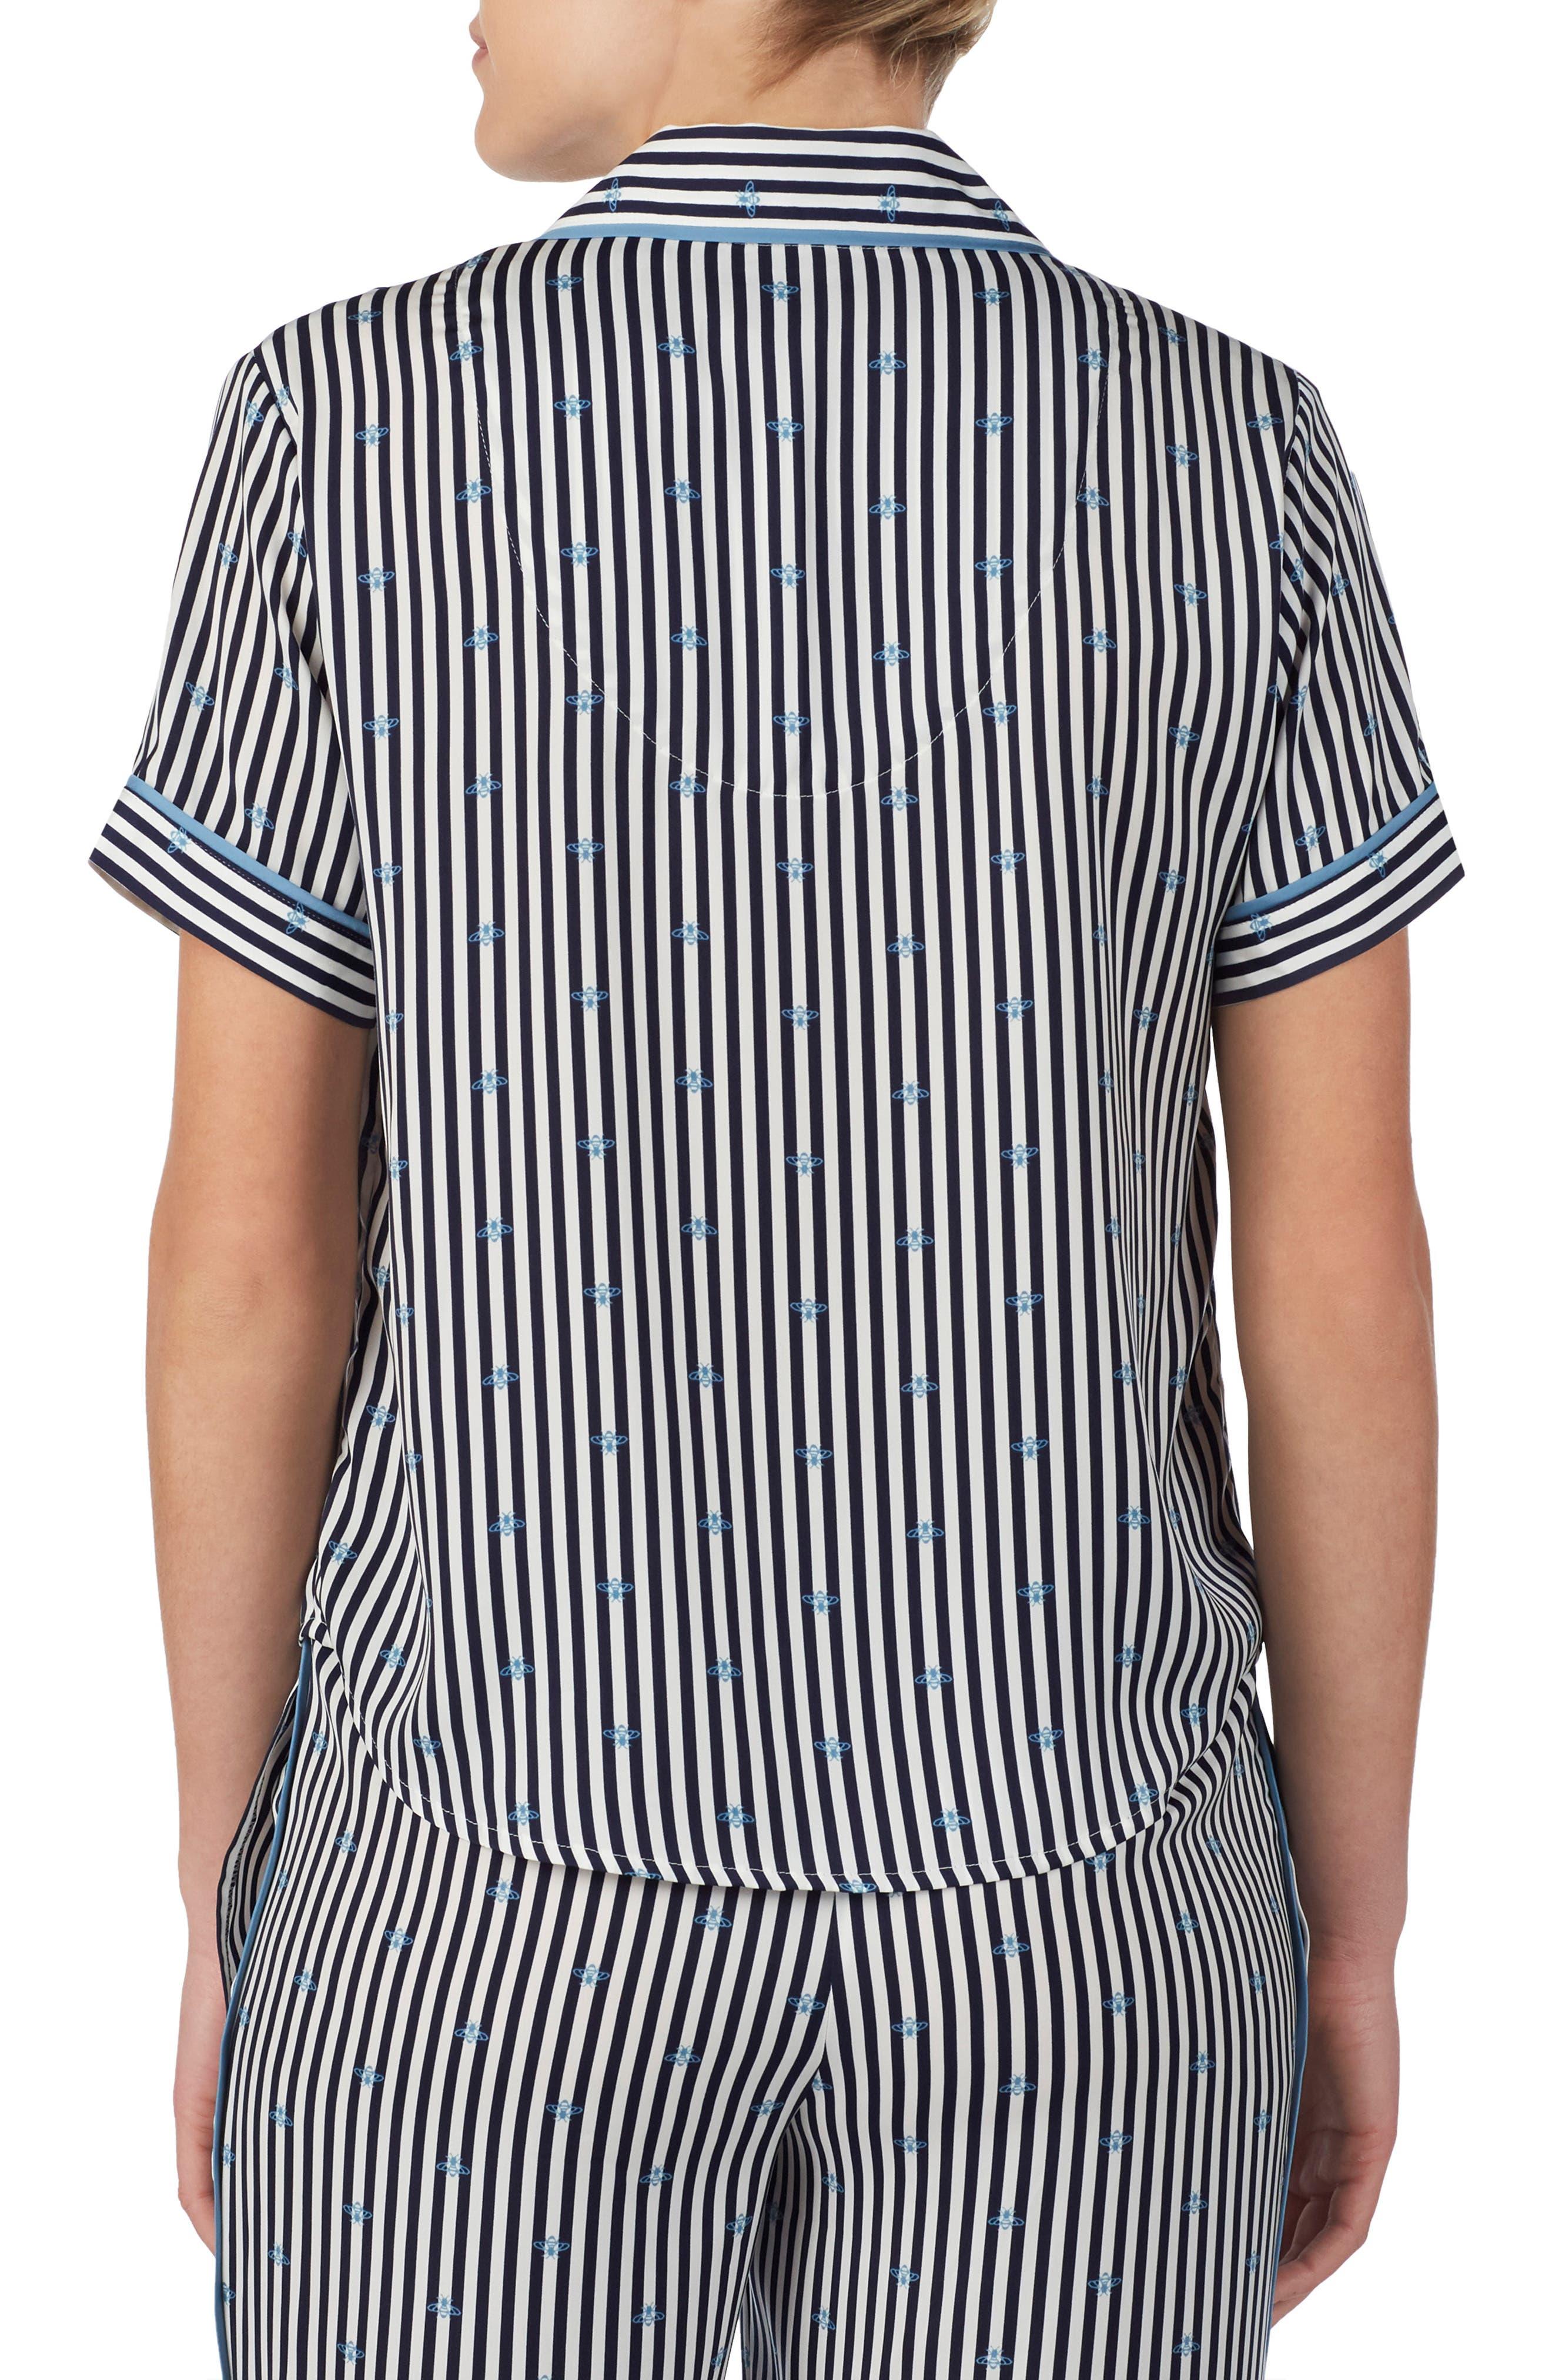 85cb7427459af Women's Sleepwear Sale | Nordstrom